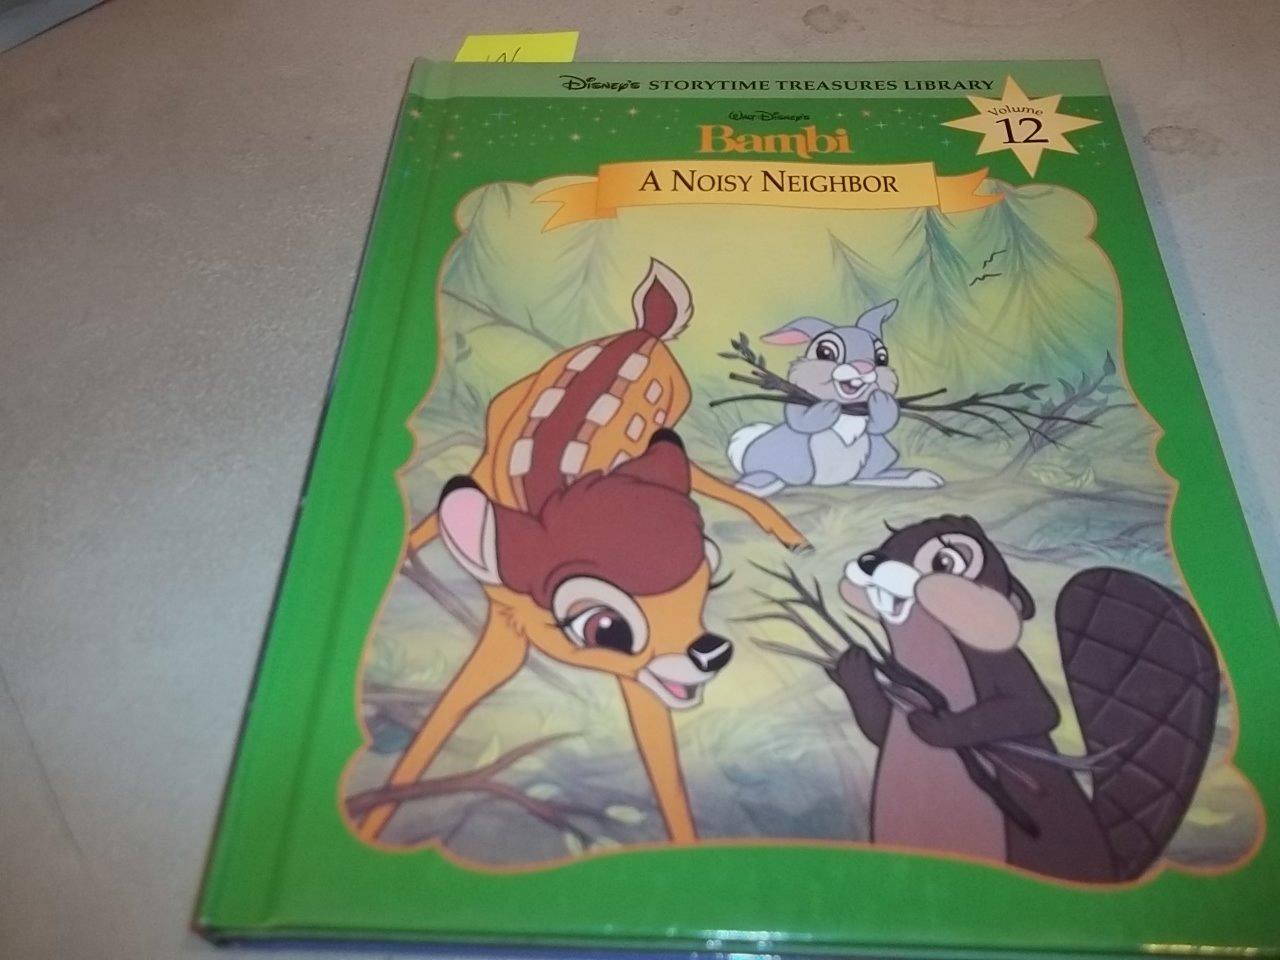 Walt disneys bambi a noisy neighbor disneys storytime treasure walt disneys bambi a noisy neighbor disneys storytime treasure library vol 12 walt disney 9781579730086 amazon books altavistaventures Image collections